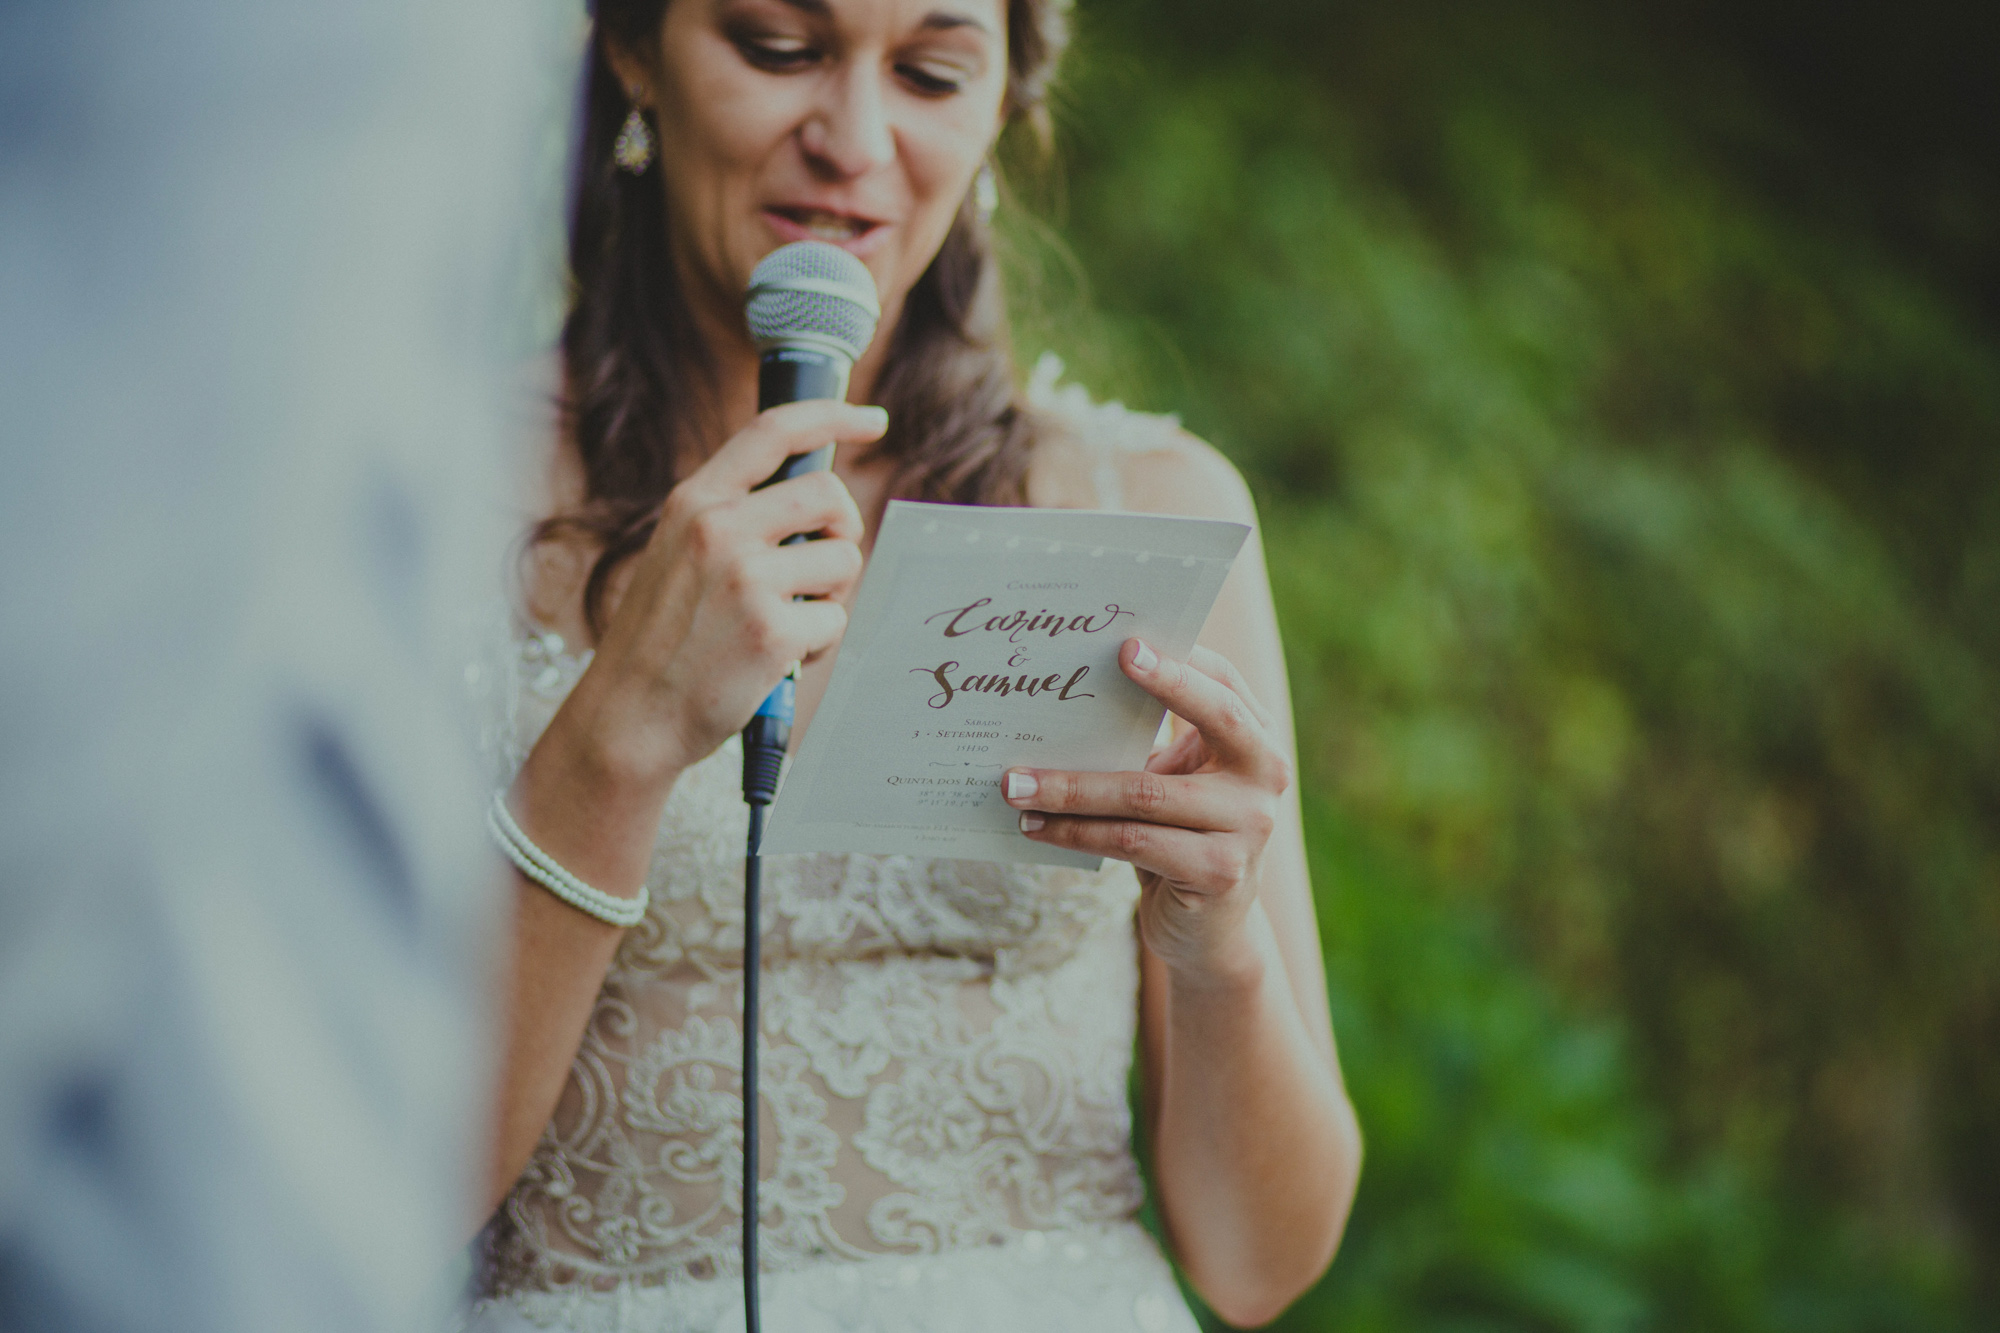 049-carina-e-samuel-wedding-casamento-quinta-dos-rouxinois-rustico-my-fancy-wedding-mafra-malveira-lisboa-sintra-cascais-filipe-santiago-fotografia-fotografo-lifestyle-destination-portugal